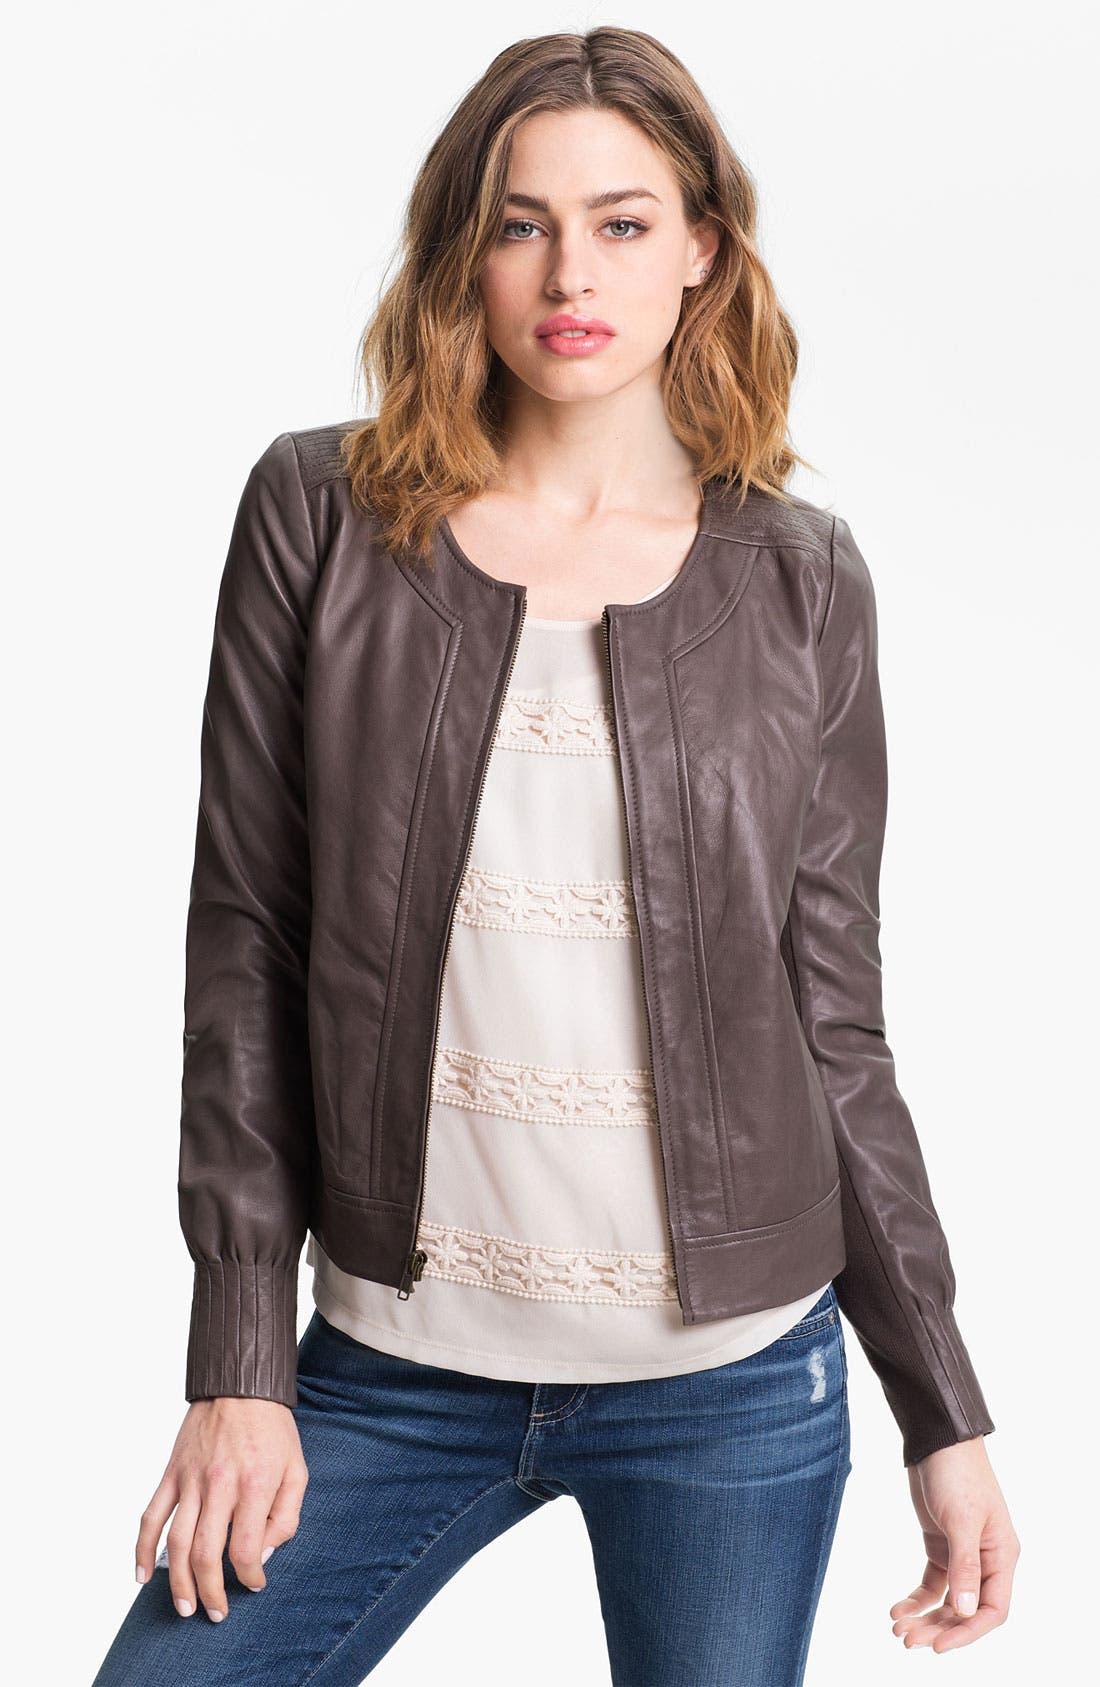 Alternate Image 1 Selected - Trouvé Pleat Detail Leather Jacket